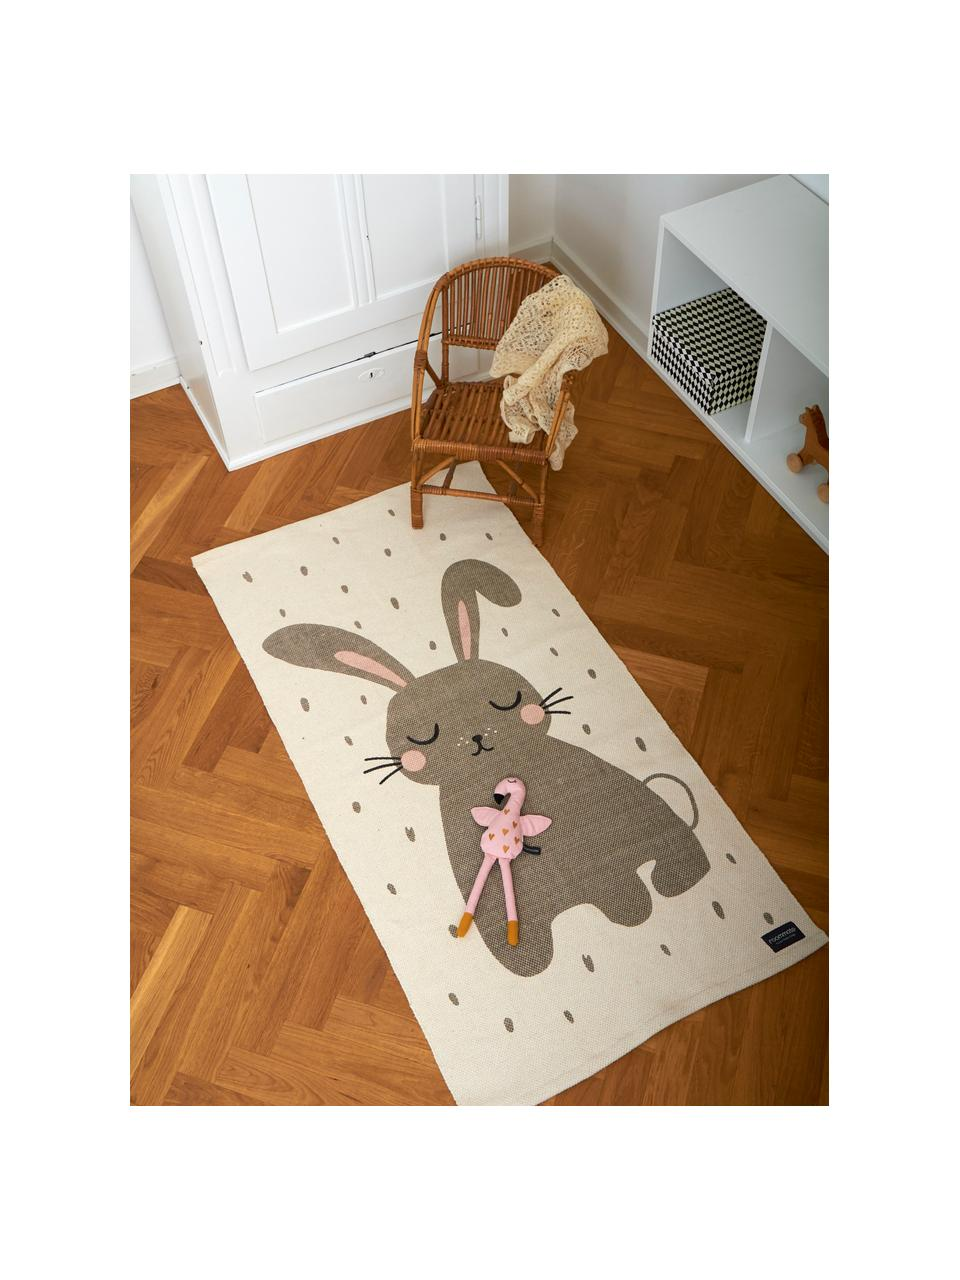 Koberec Rabbit, Šedo-bílá